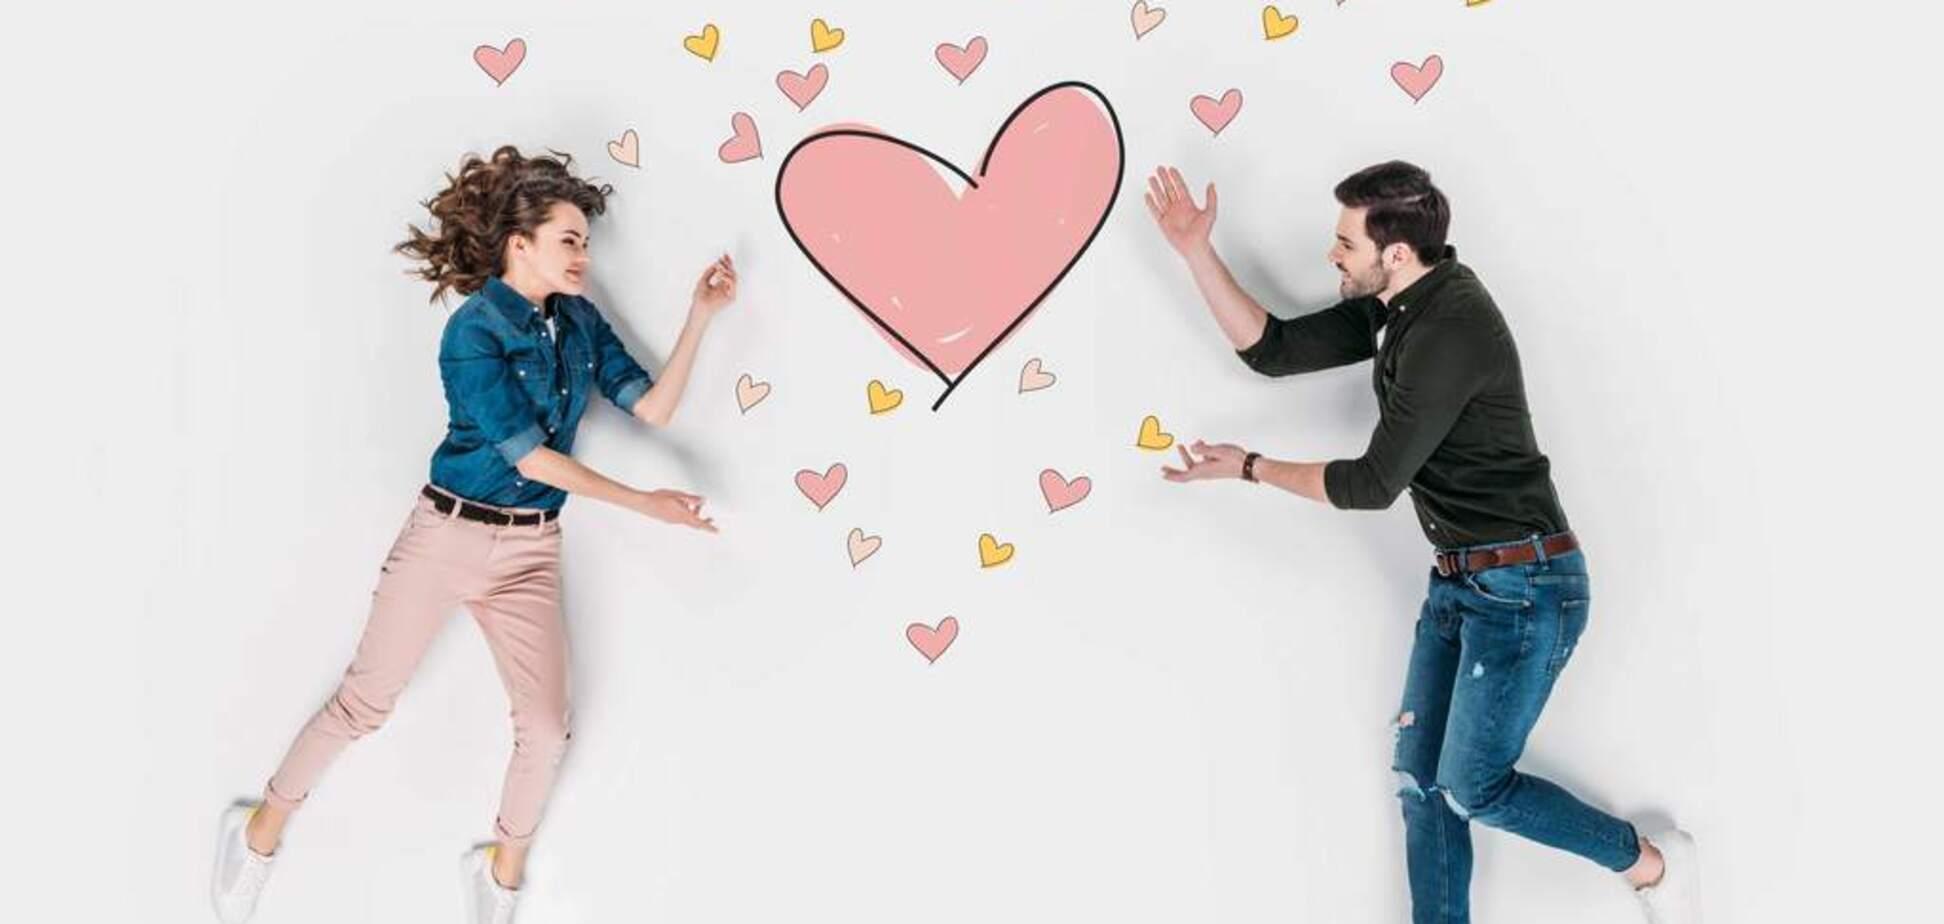 Топ-5 подарков ко Дню святого Валентина: удиви свою вторую половинку!